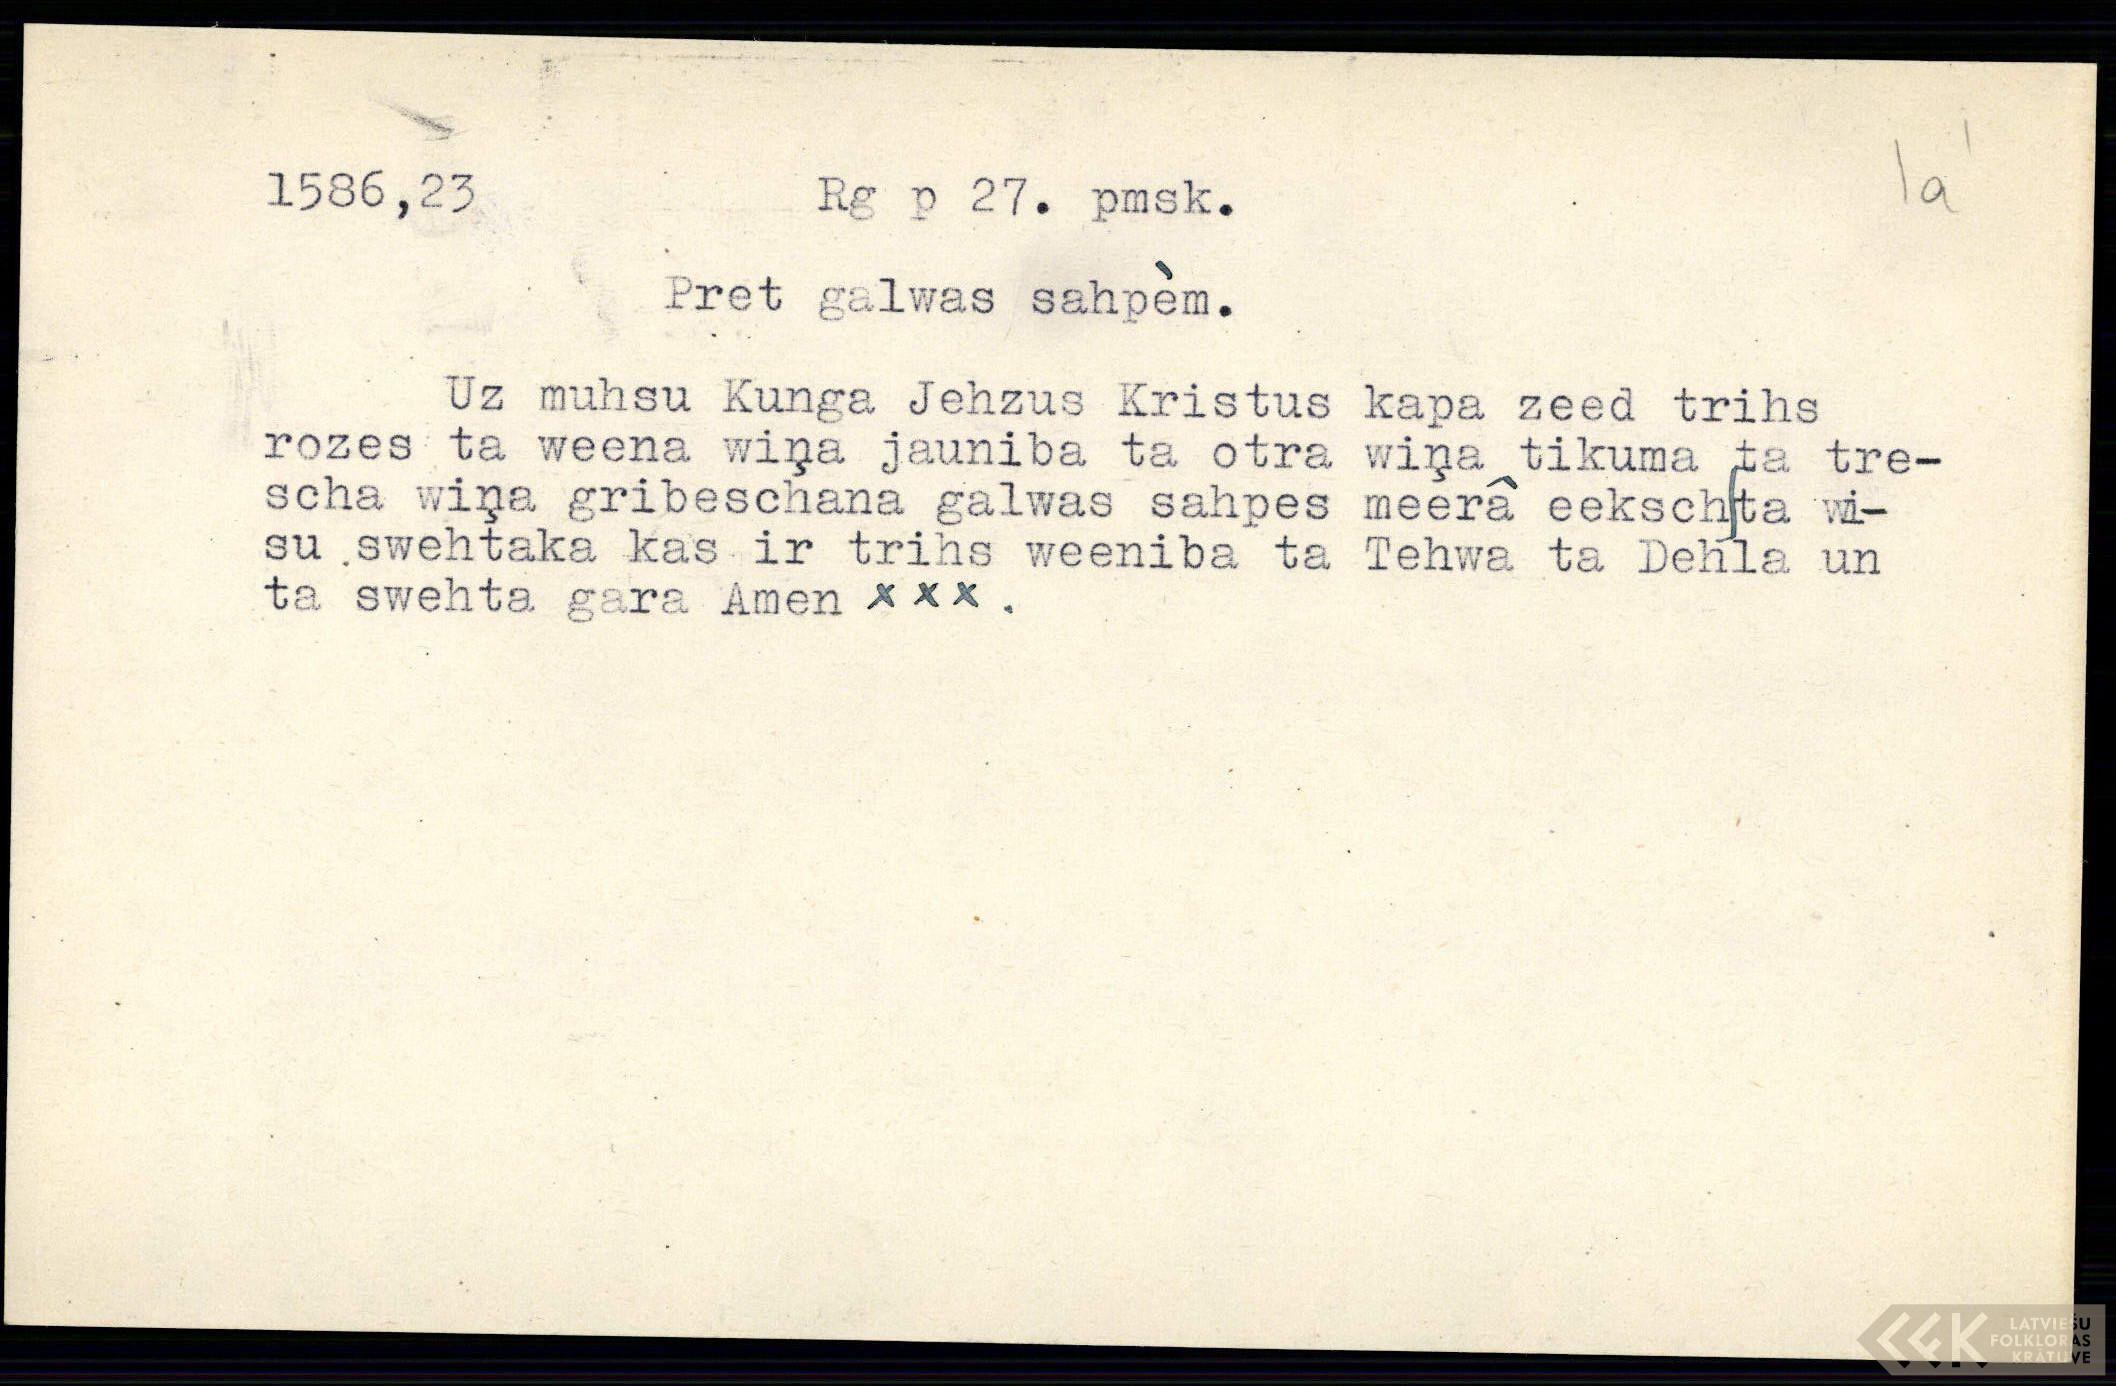 LFK-1586-00023-buramvardu-kartoteka